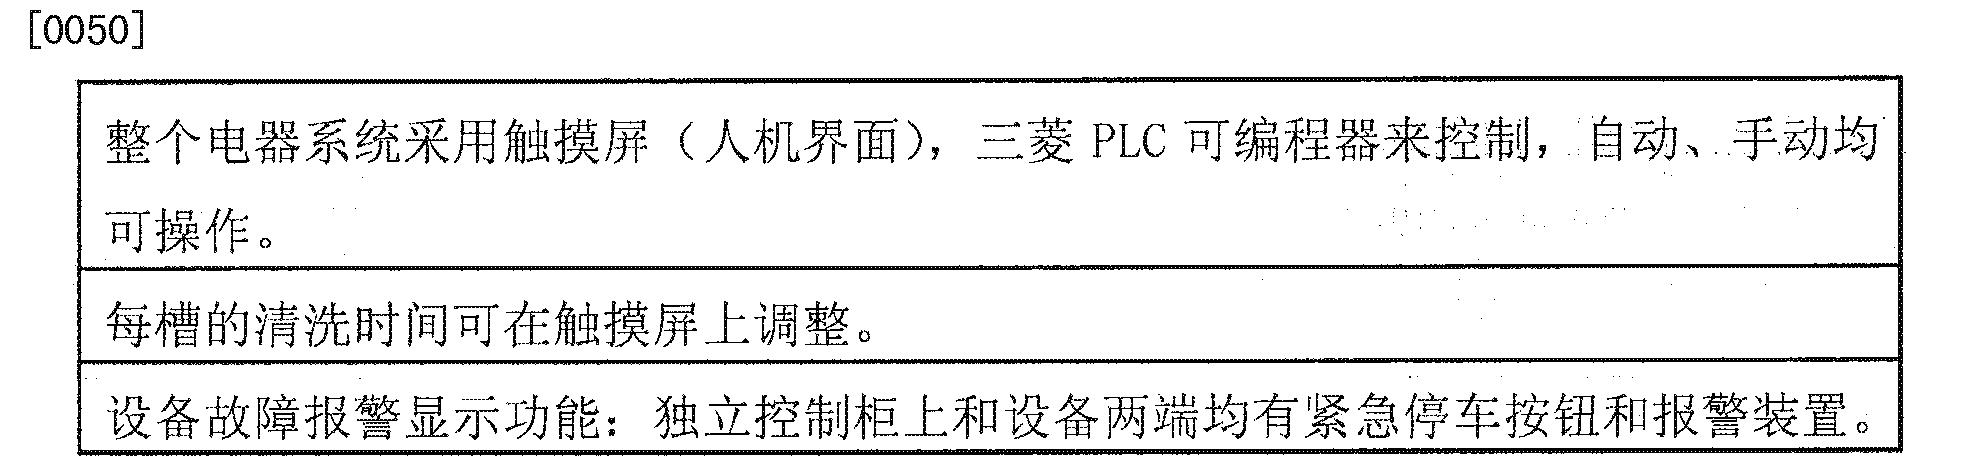 Figure CN204035120UD00122